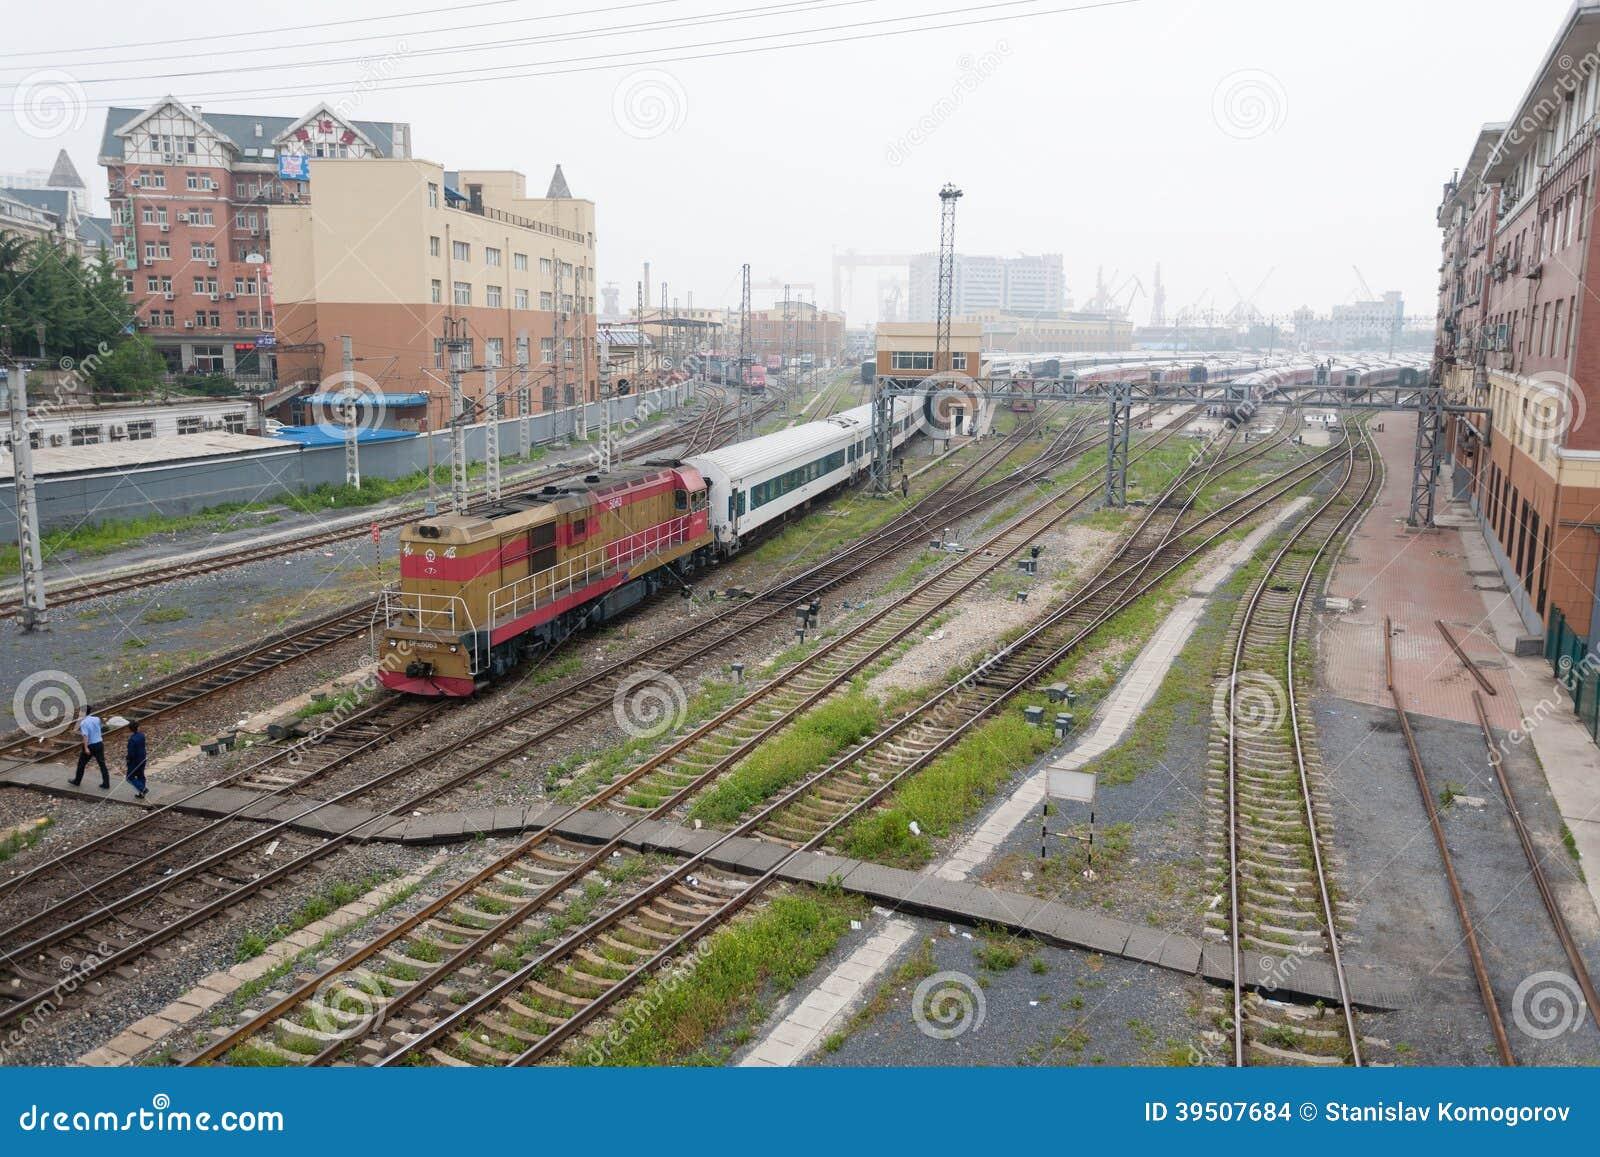 Railroad tracks in Dalian, China